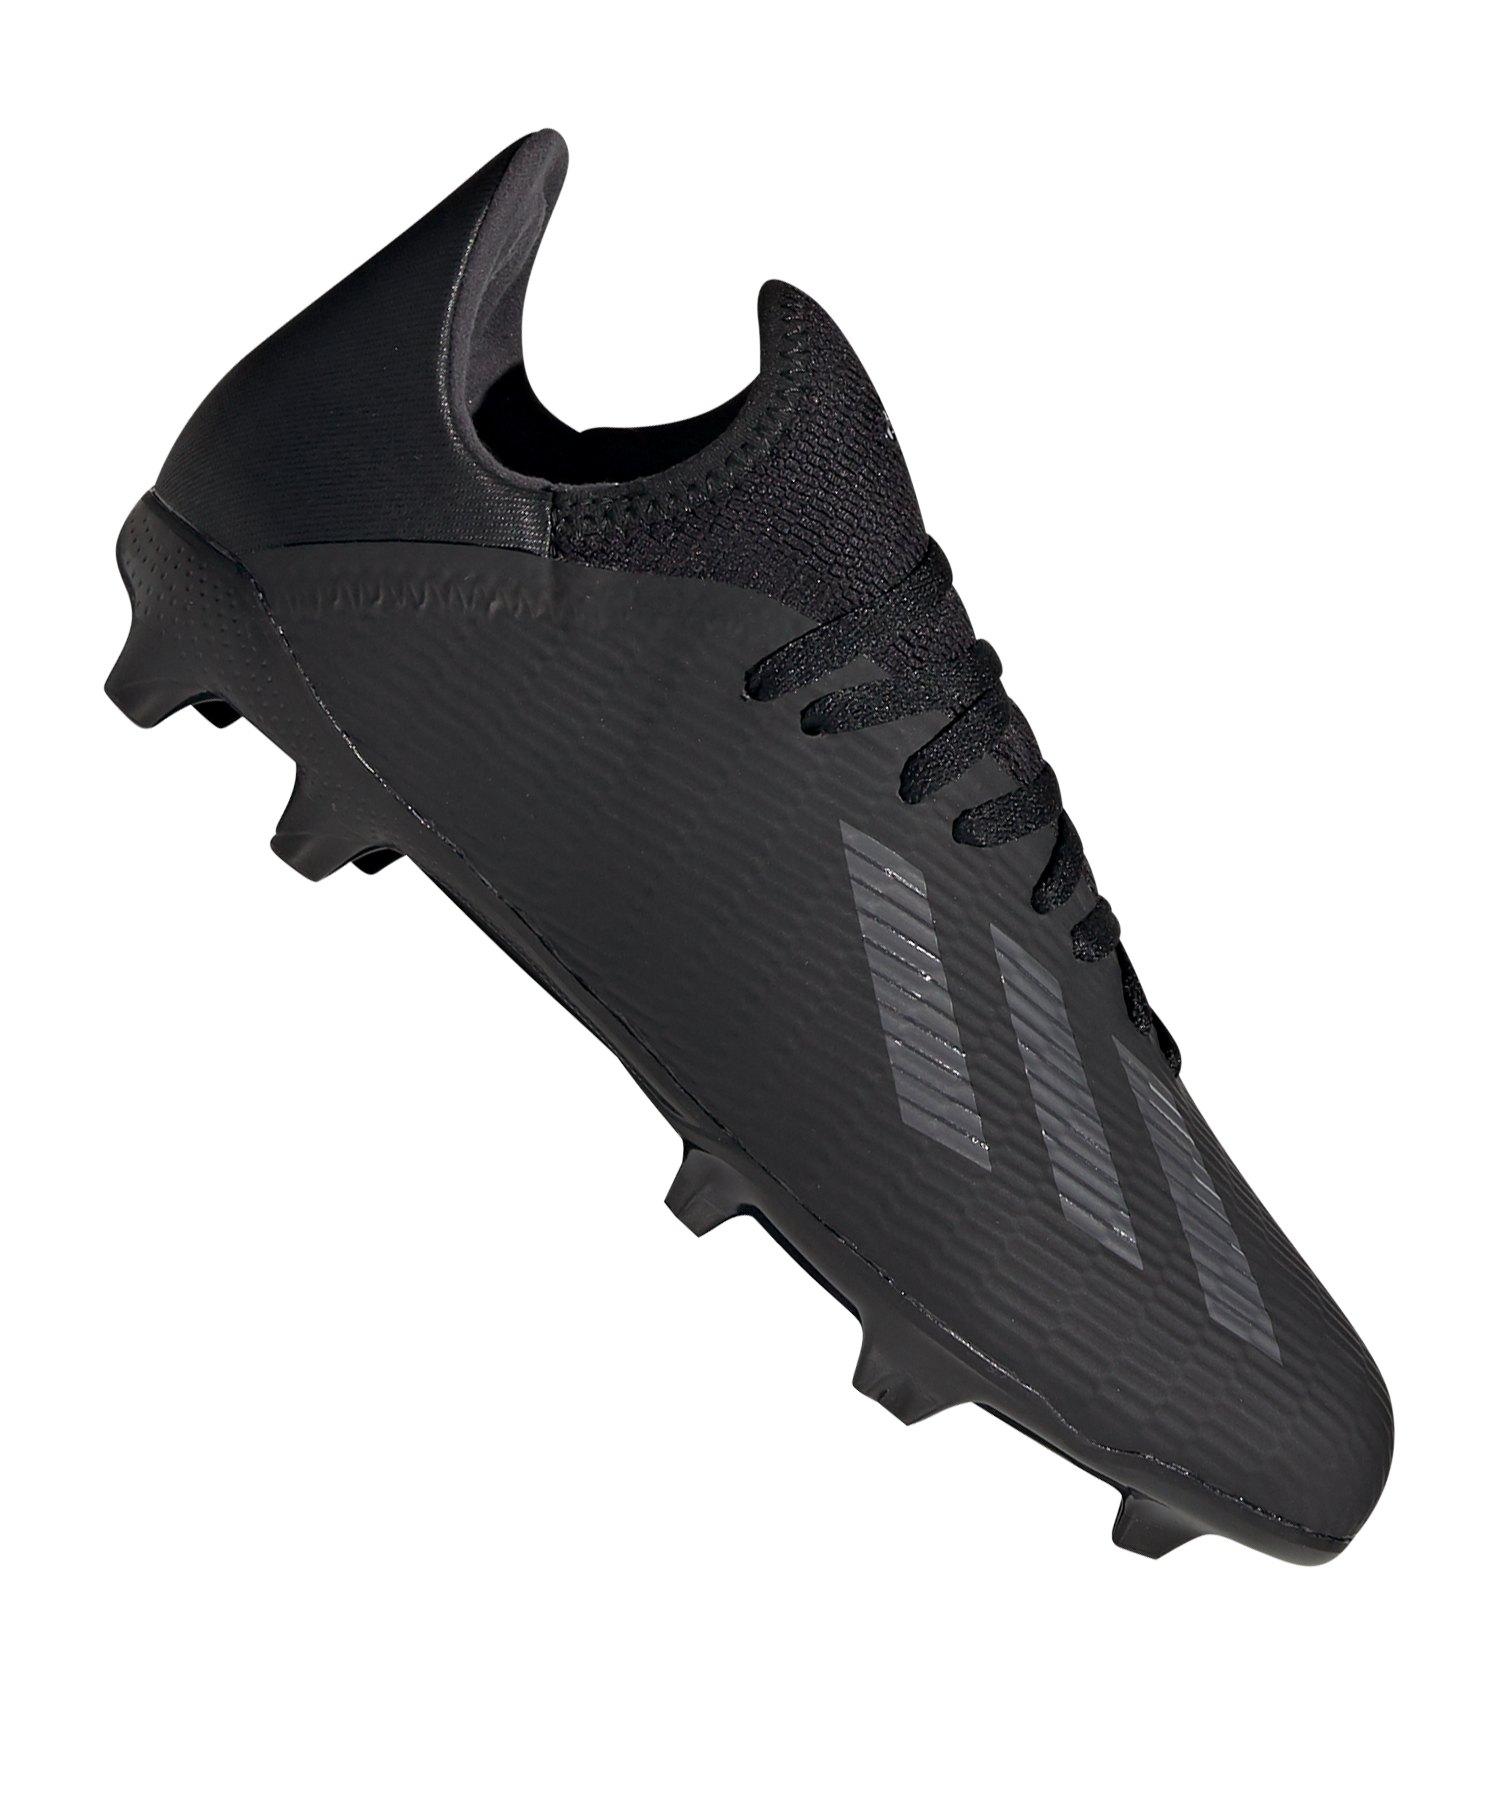 adidas X 19.3 FG J Kids Schwarz Silber - Schwarz